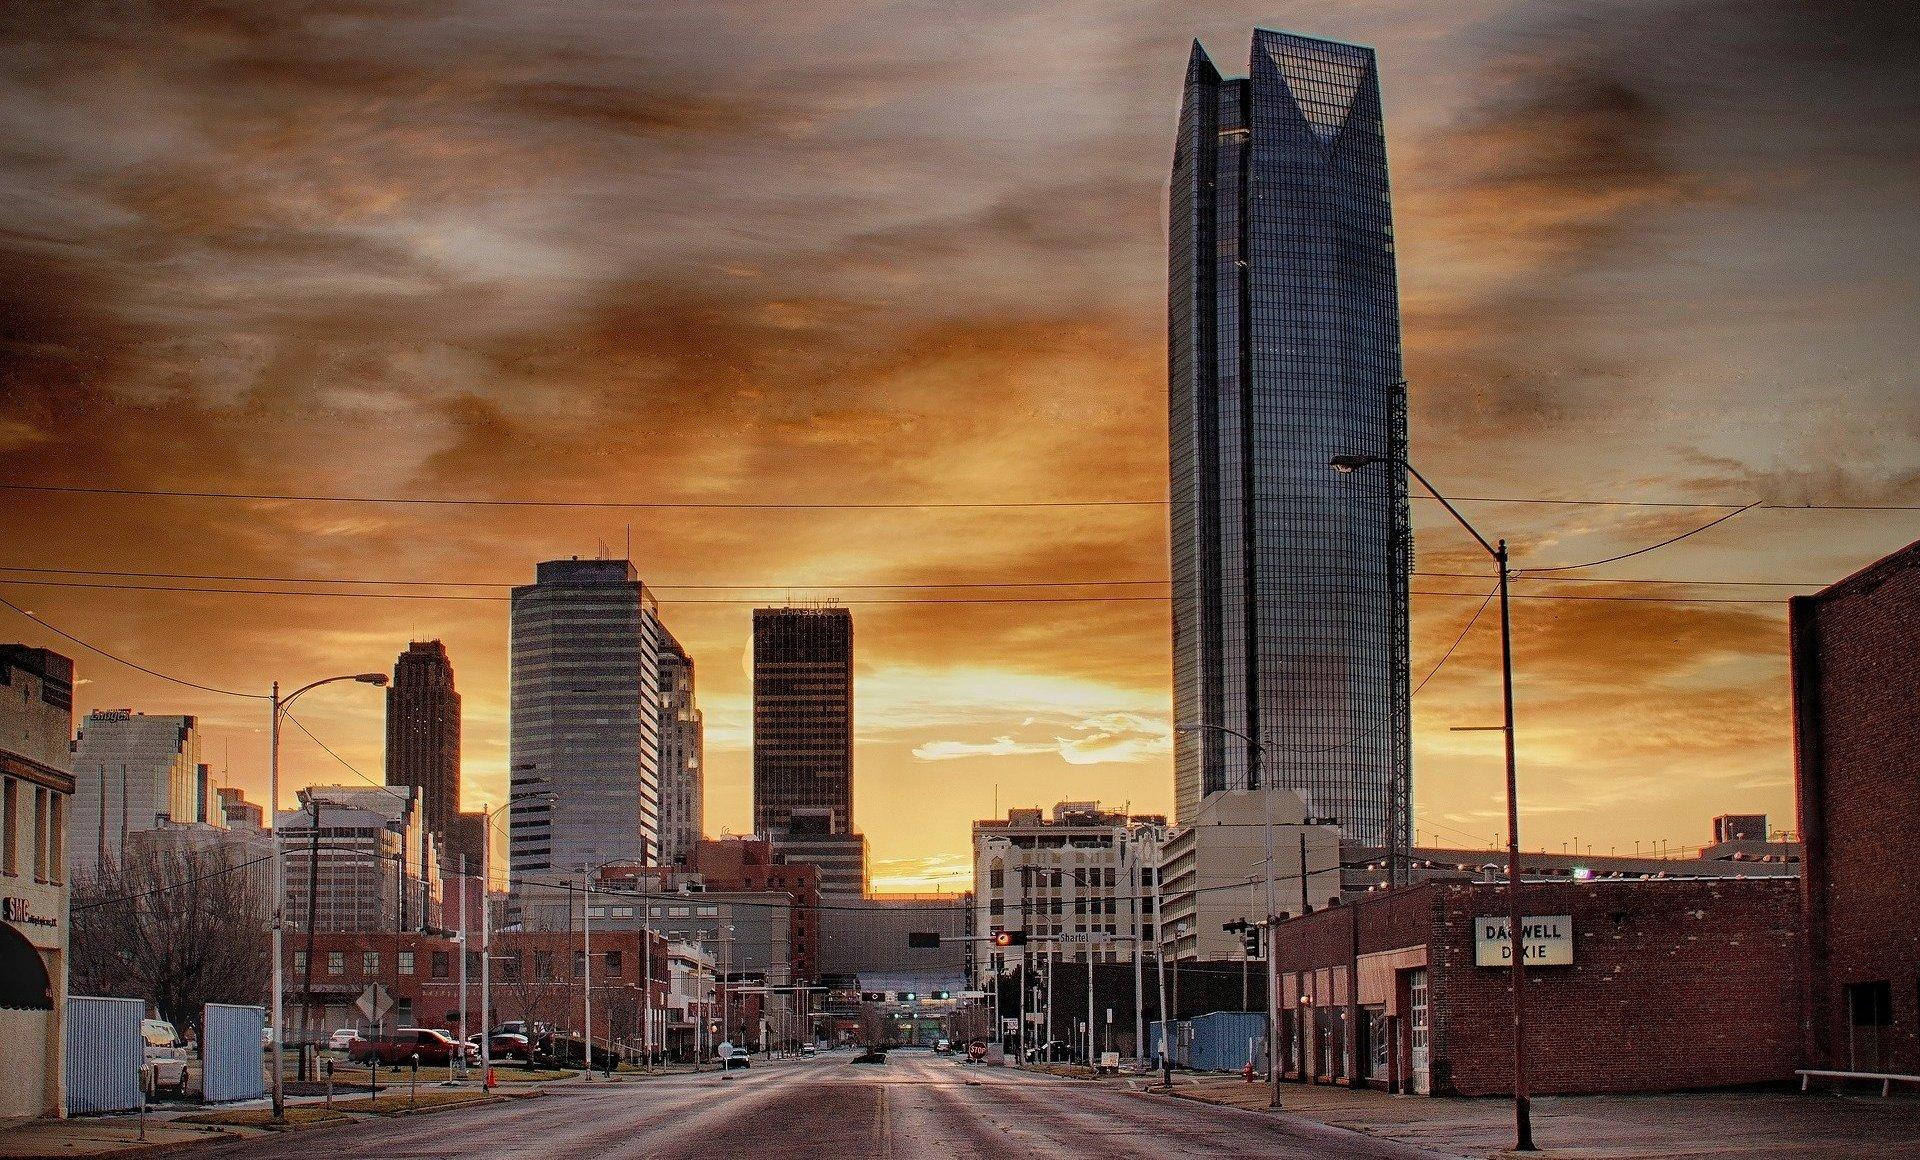 city-1907536_1920-437876-edited